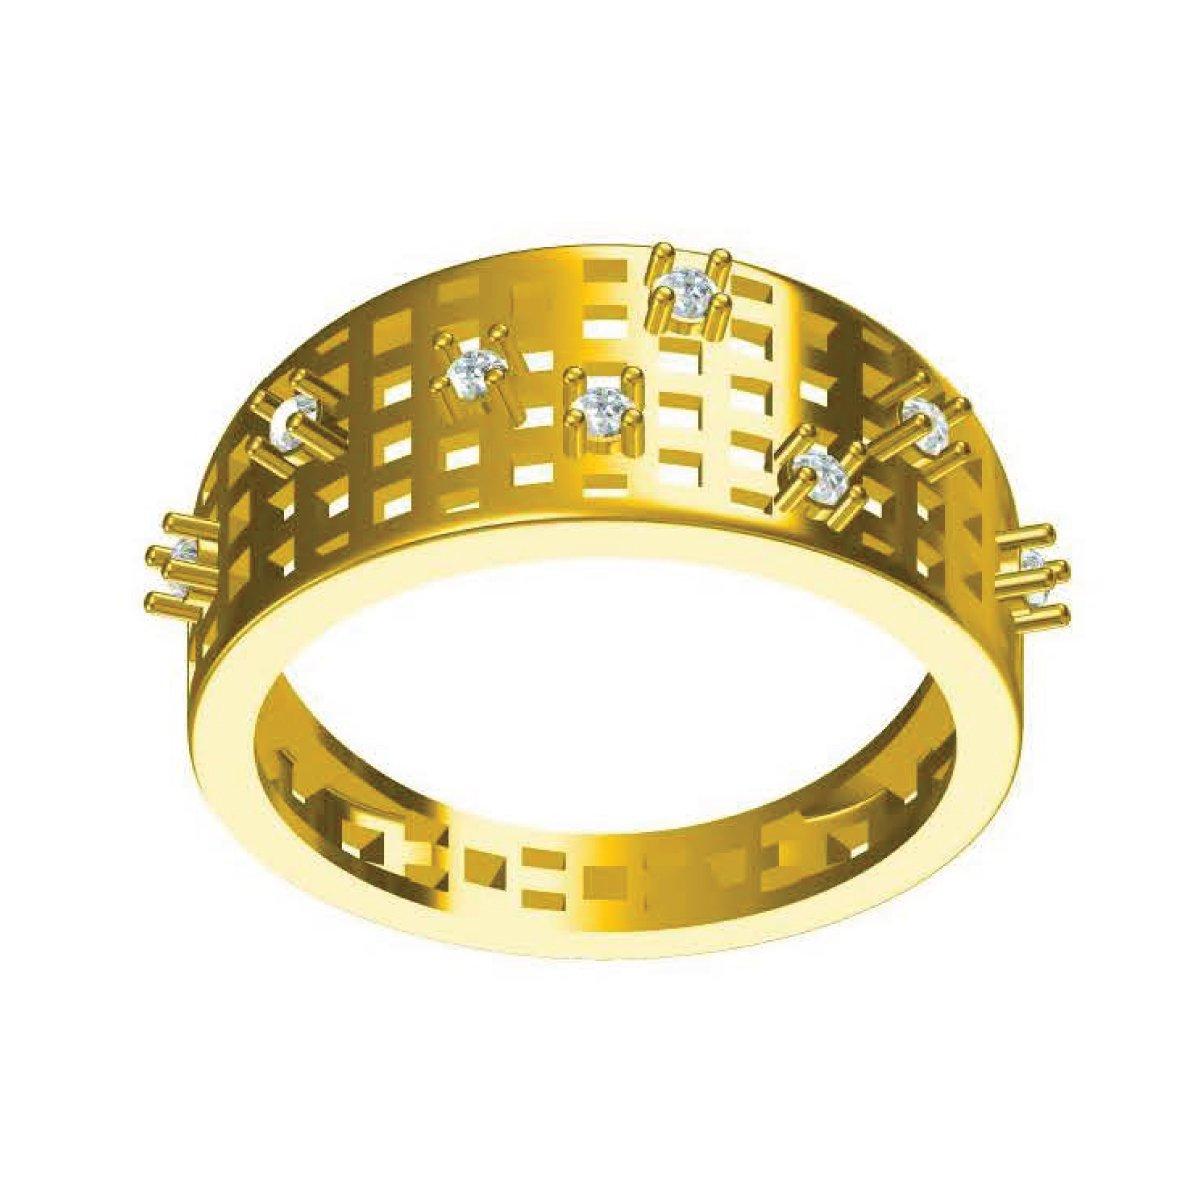 Starry Night Gold Ring